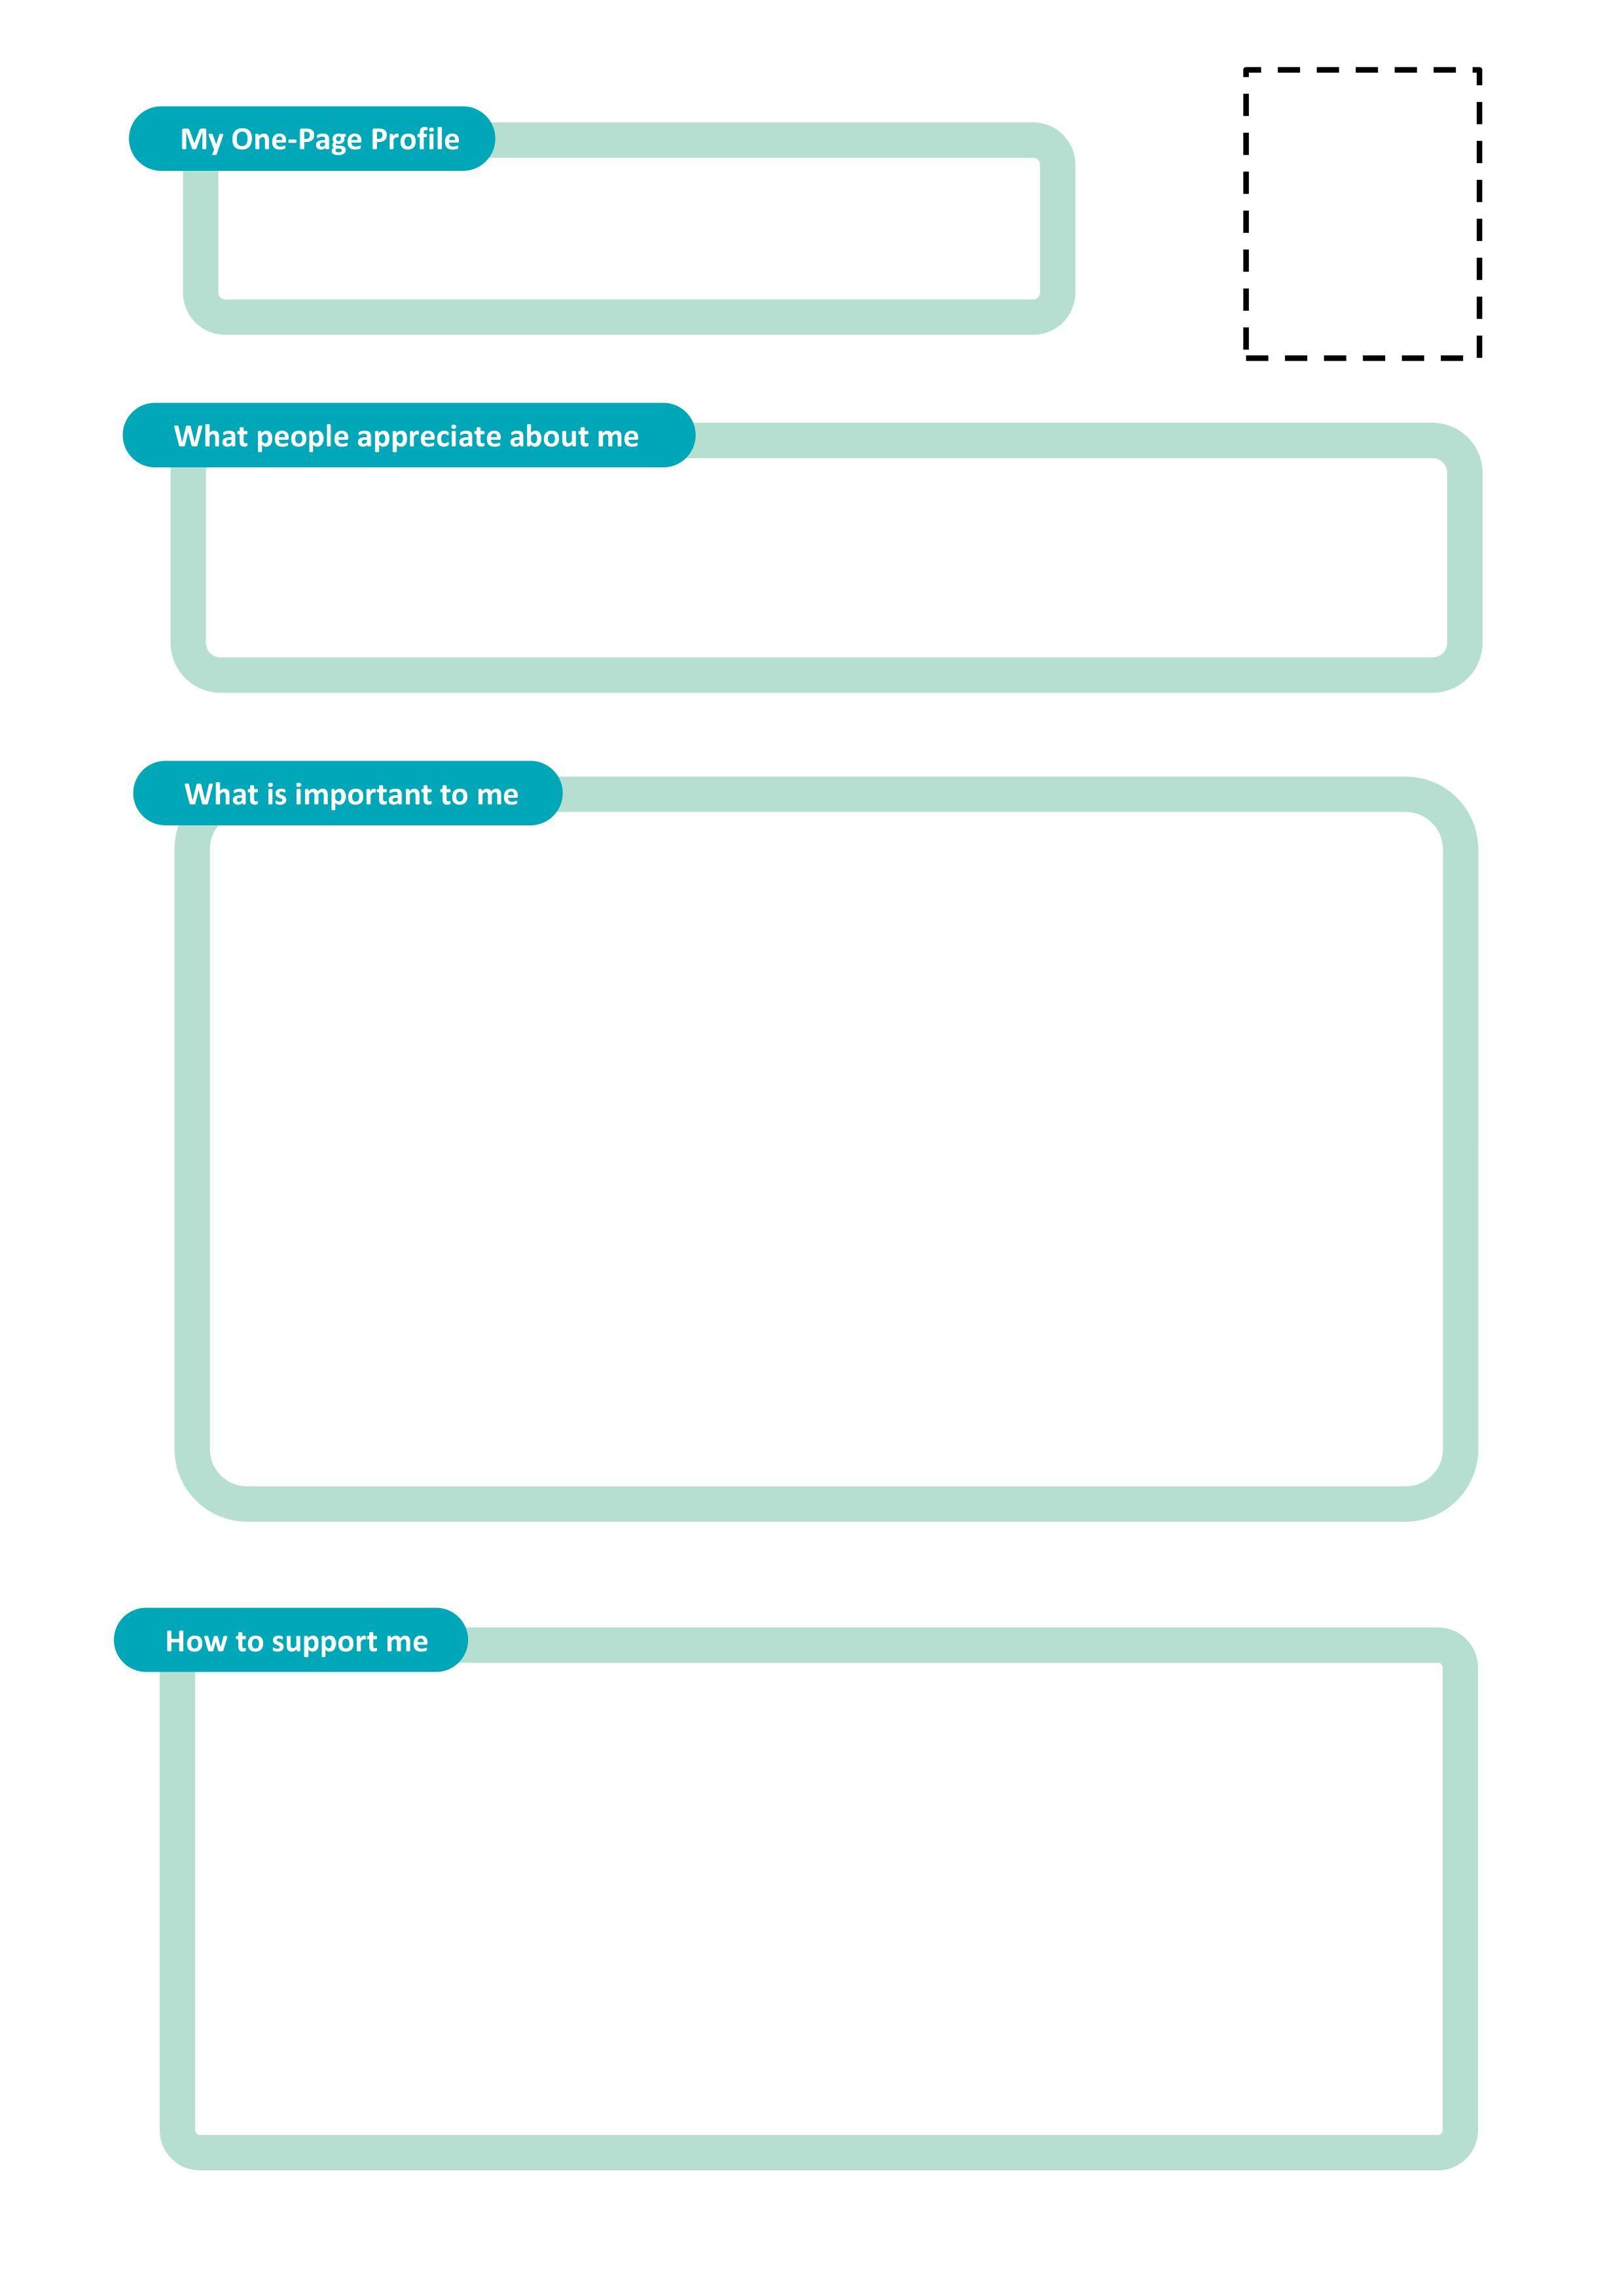 Onepage profile templates Helen Sanderson Associates